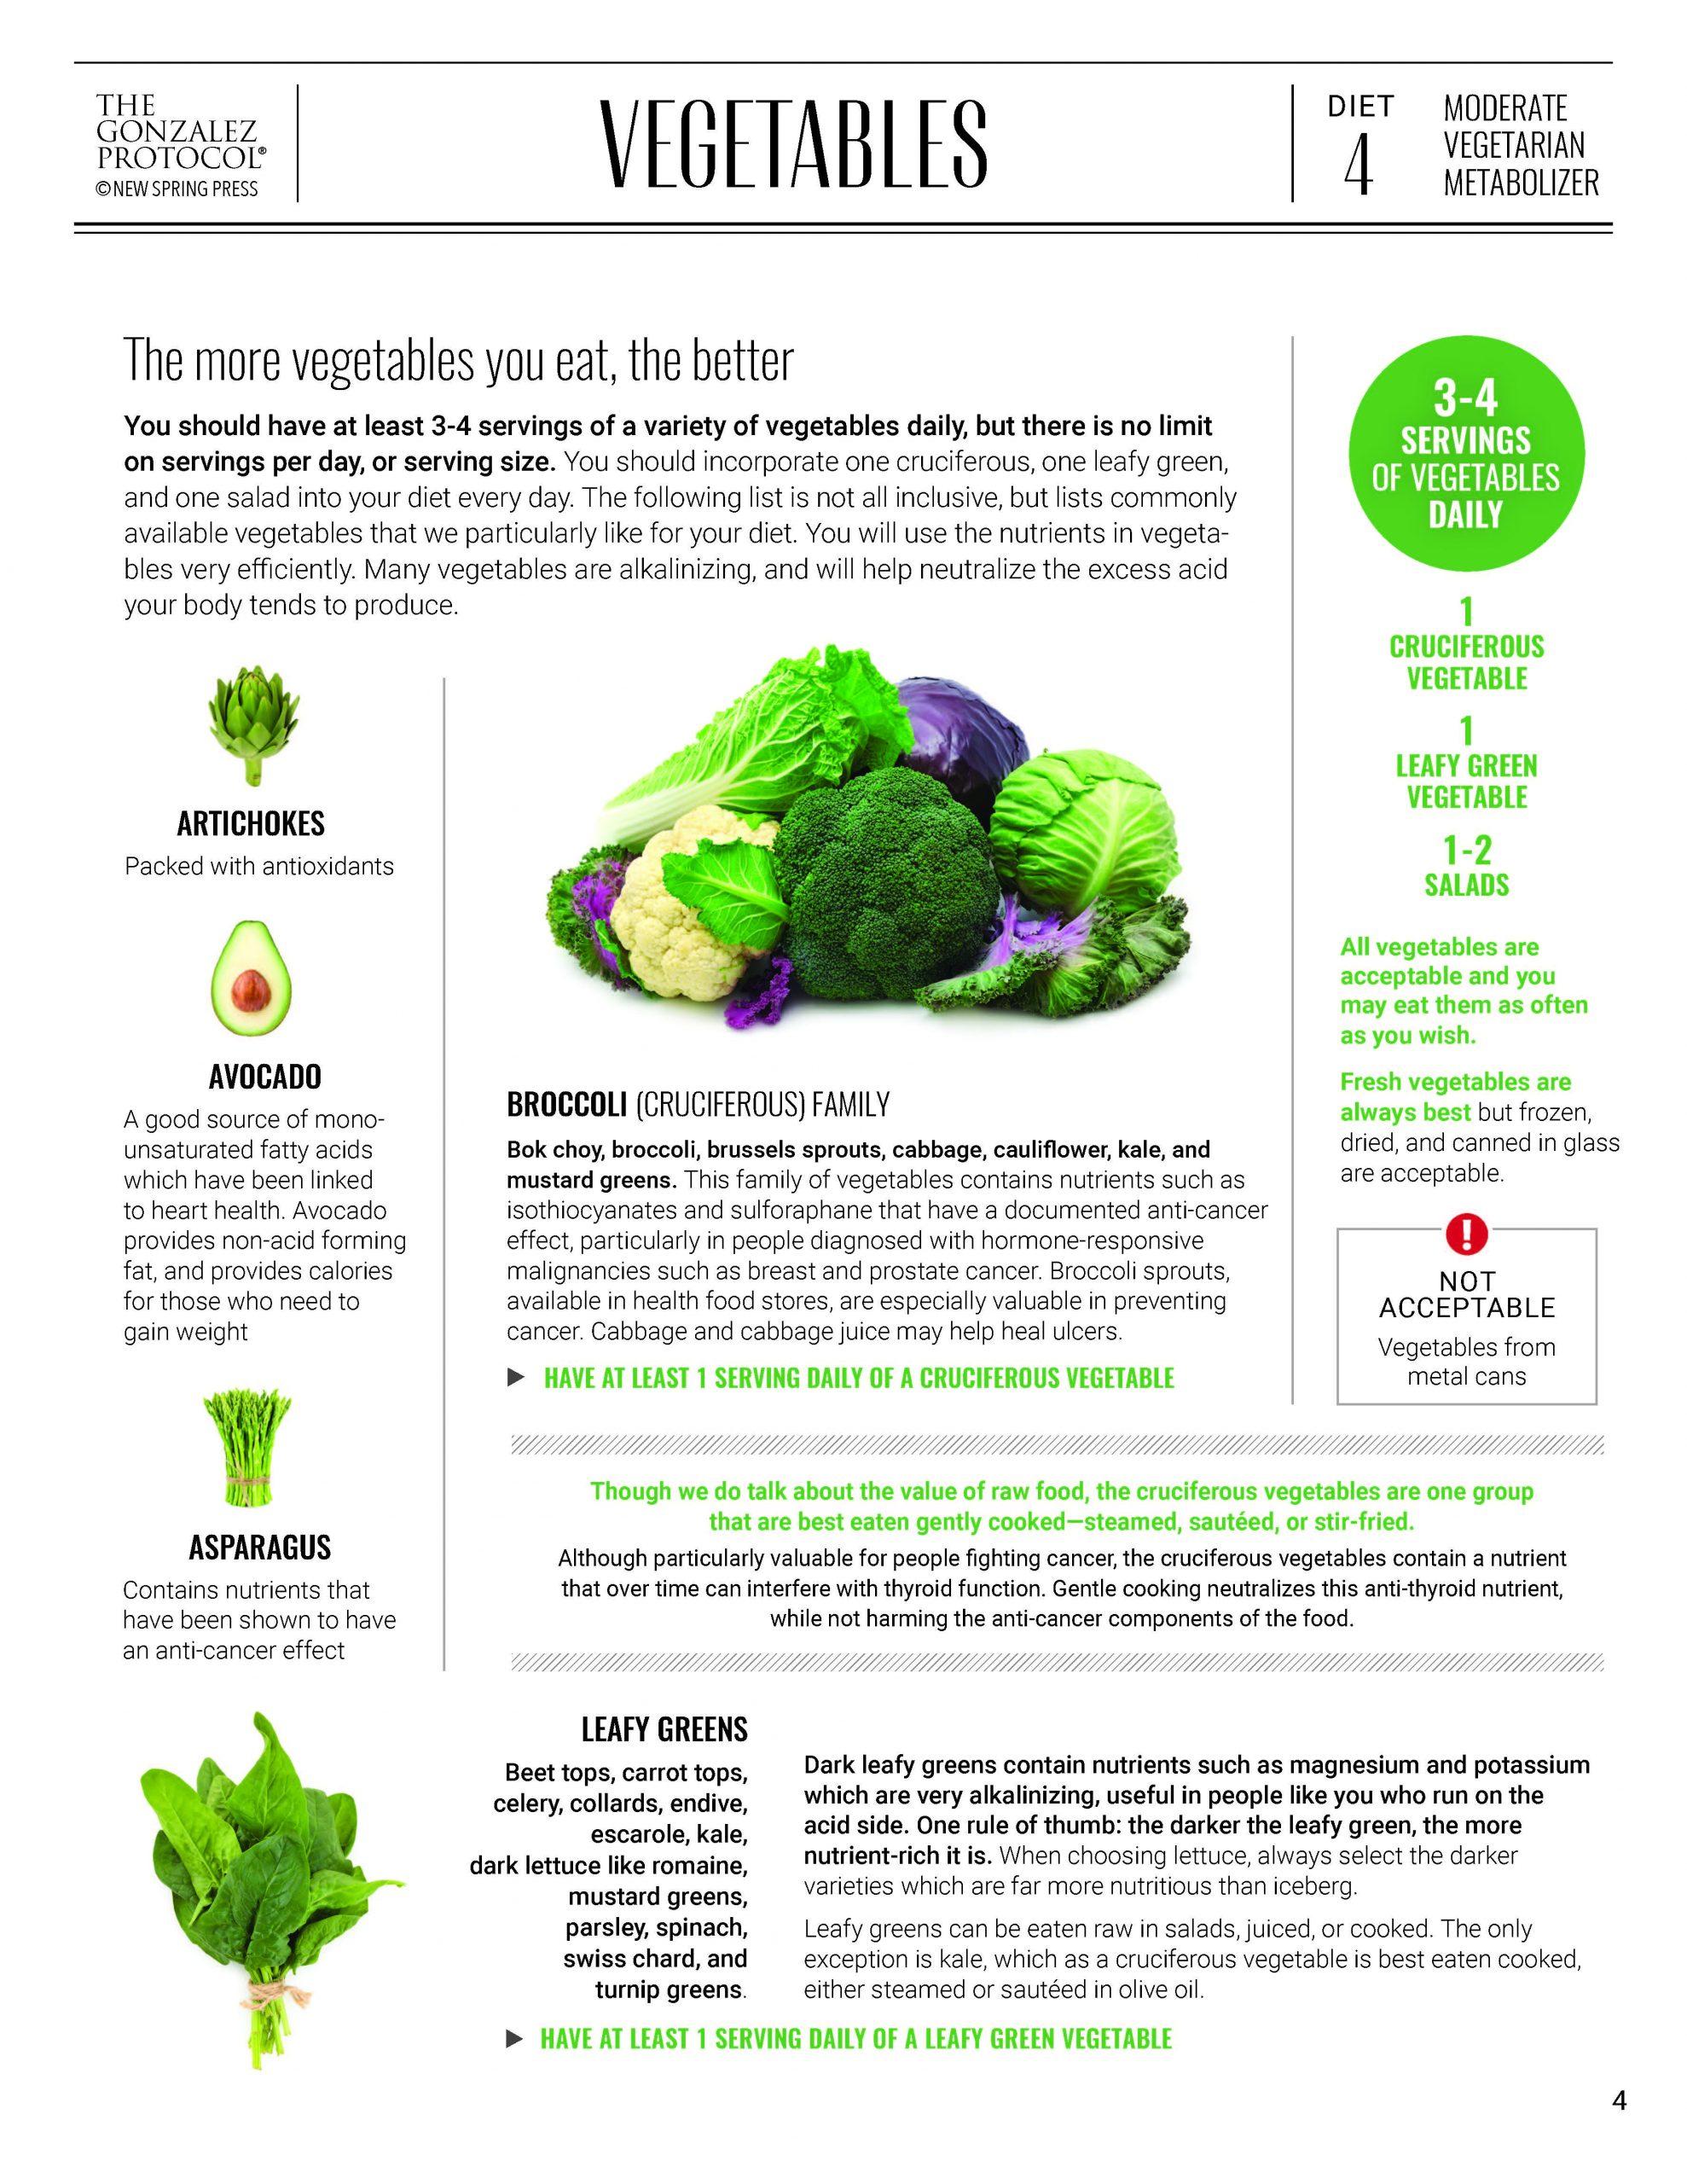 Moderate Vegetarian VEGETABLES